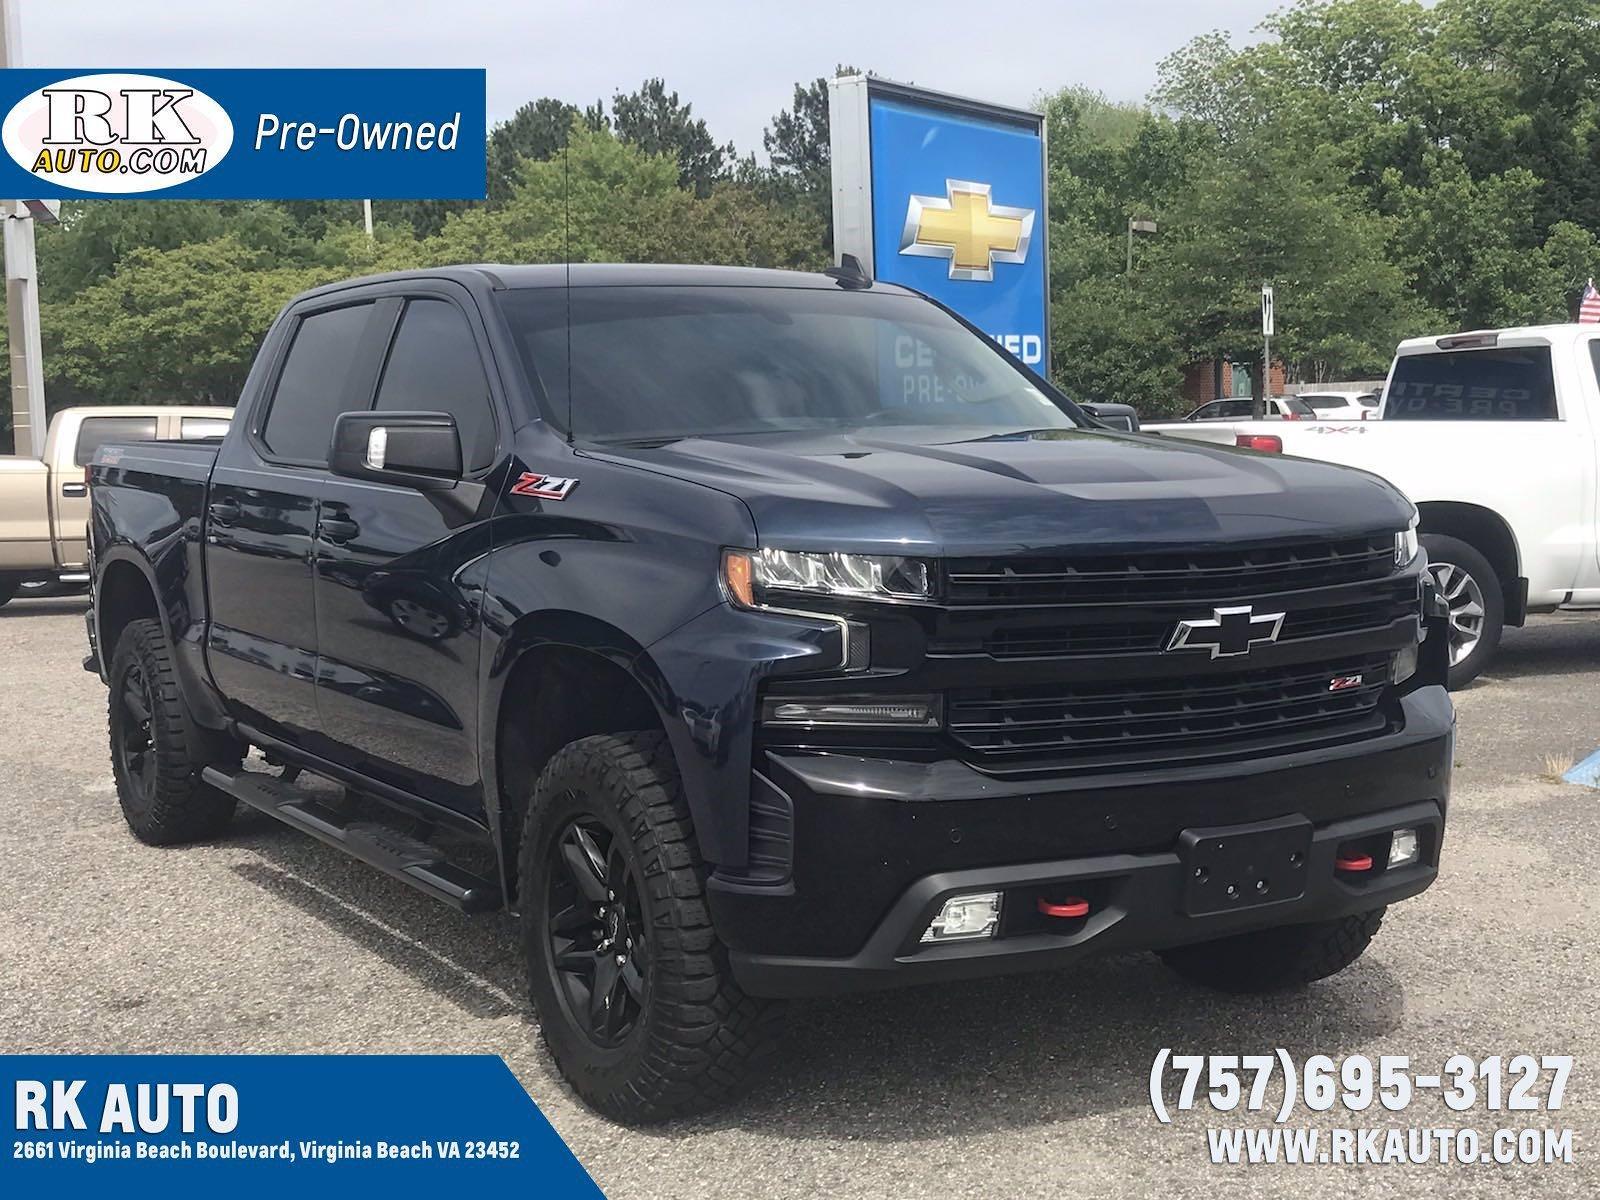 2019 Chevrolet Silverado 1500 Crew Cab 4x4, Pickup #16609P - photo 1